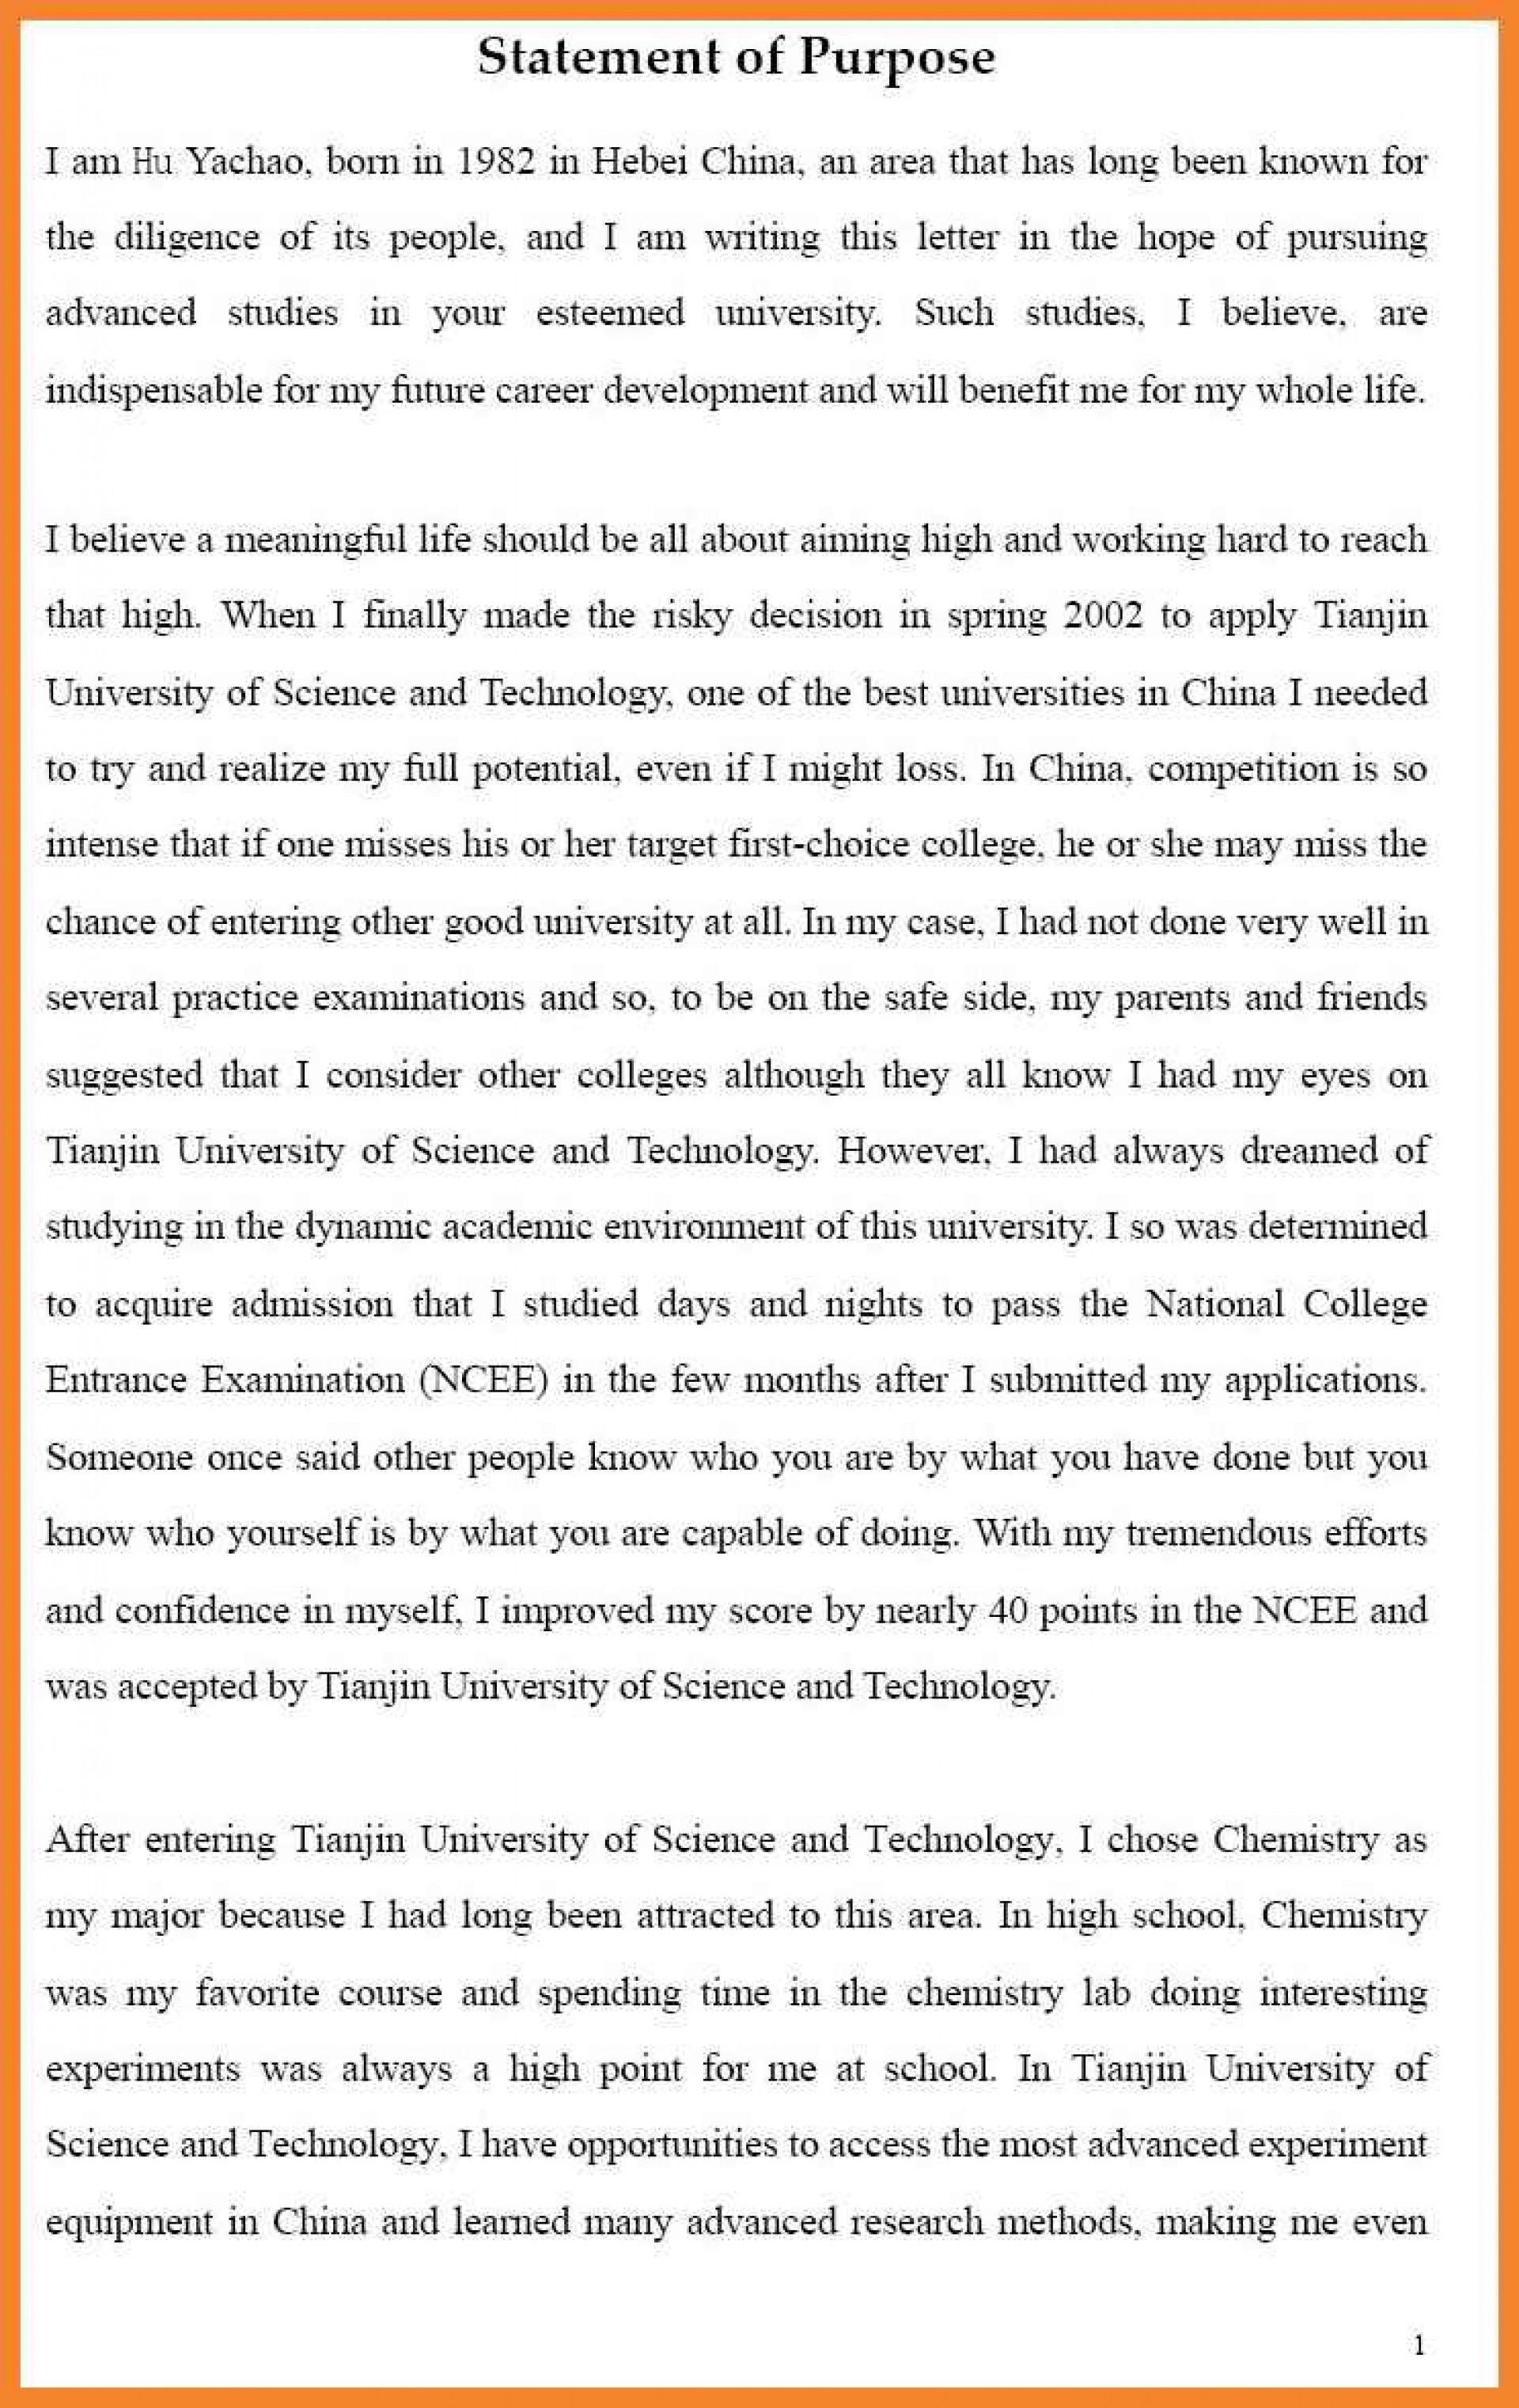 006 Essay Example I Believe Essays Impressive This Examples College Rubric Format 1920